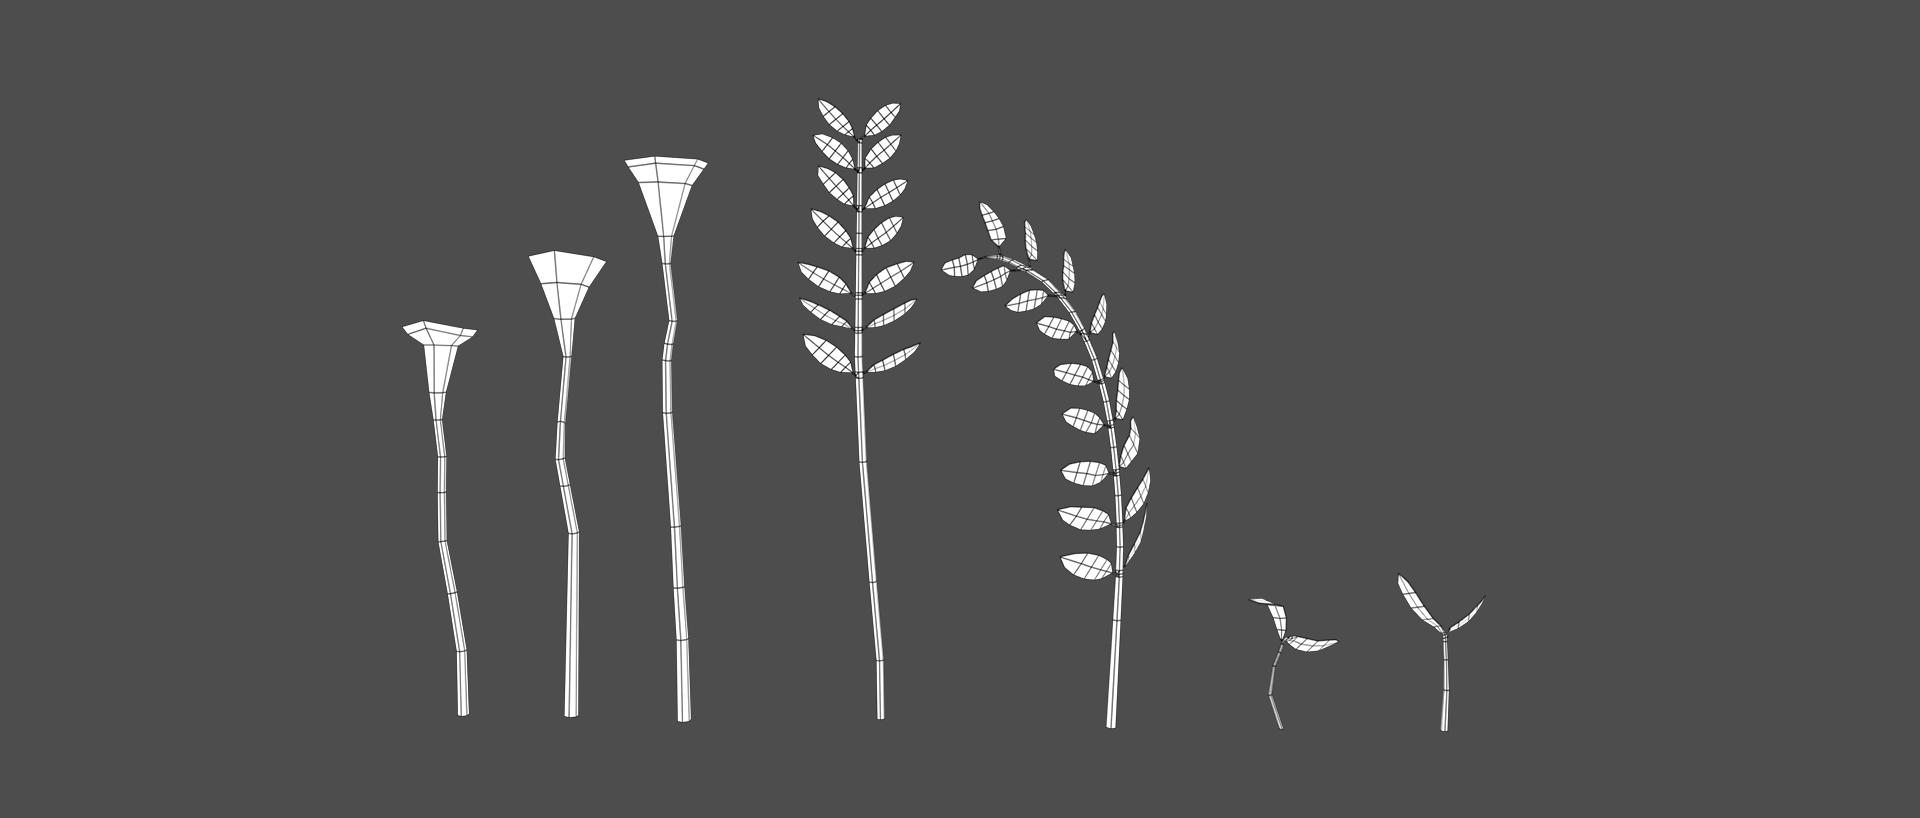 smallplants02.jpg